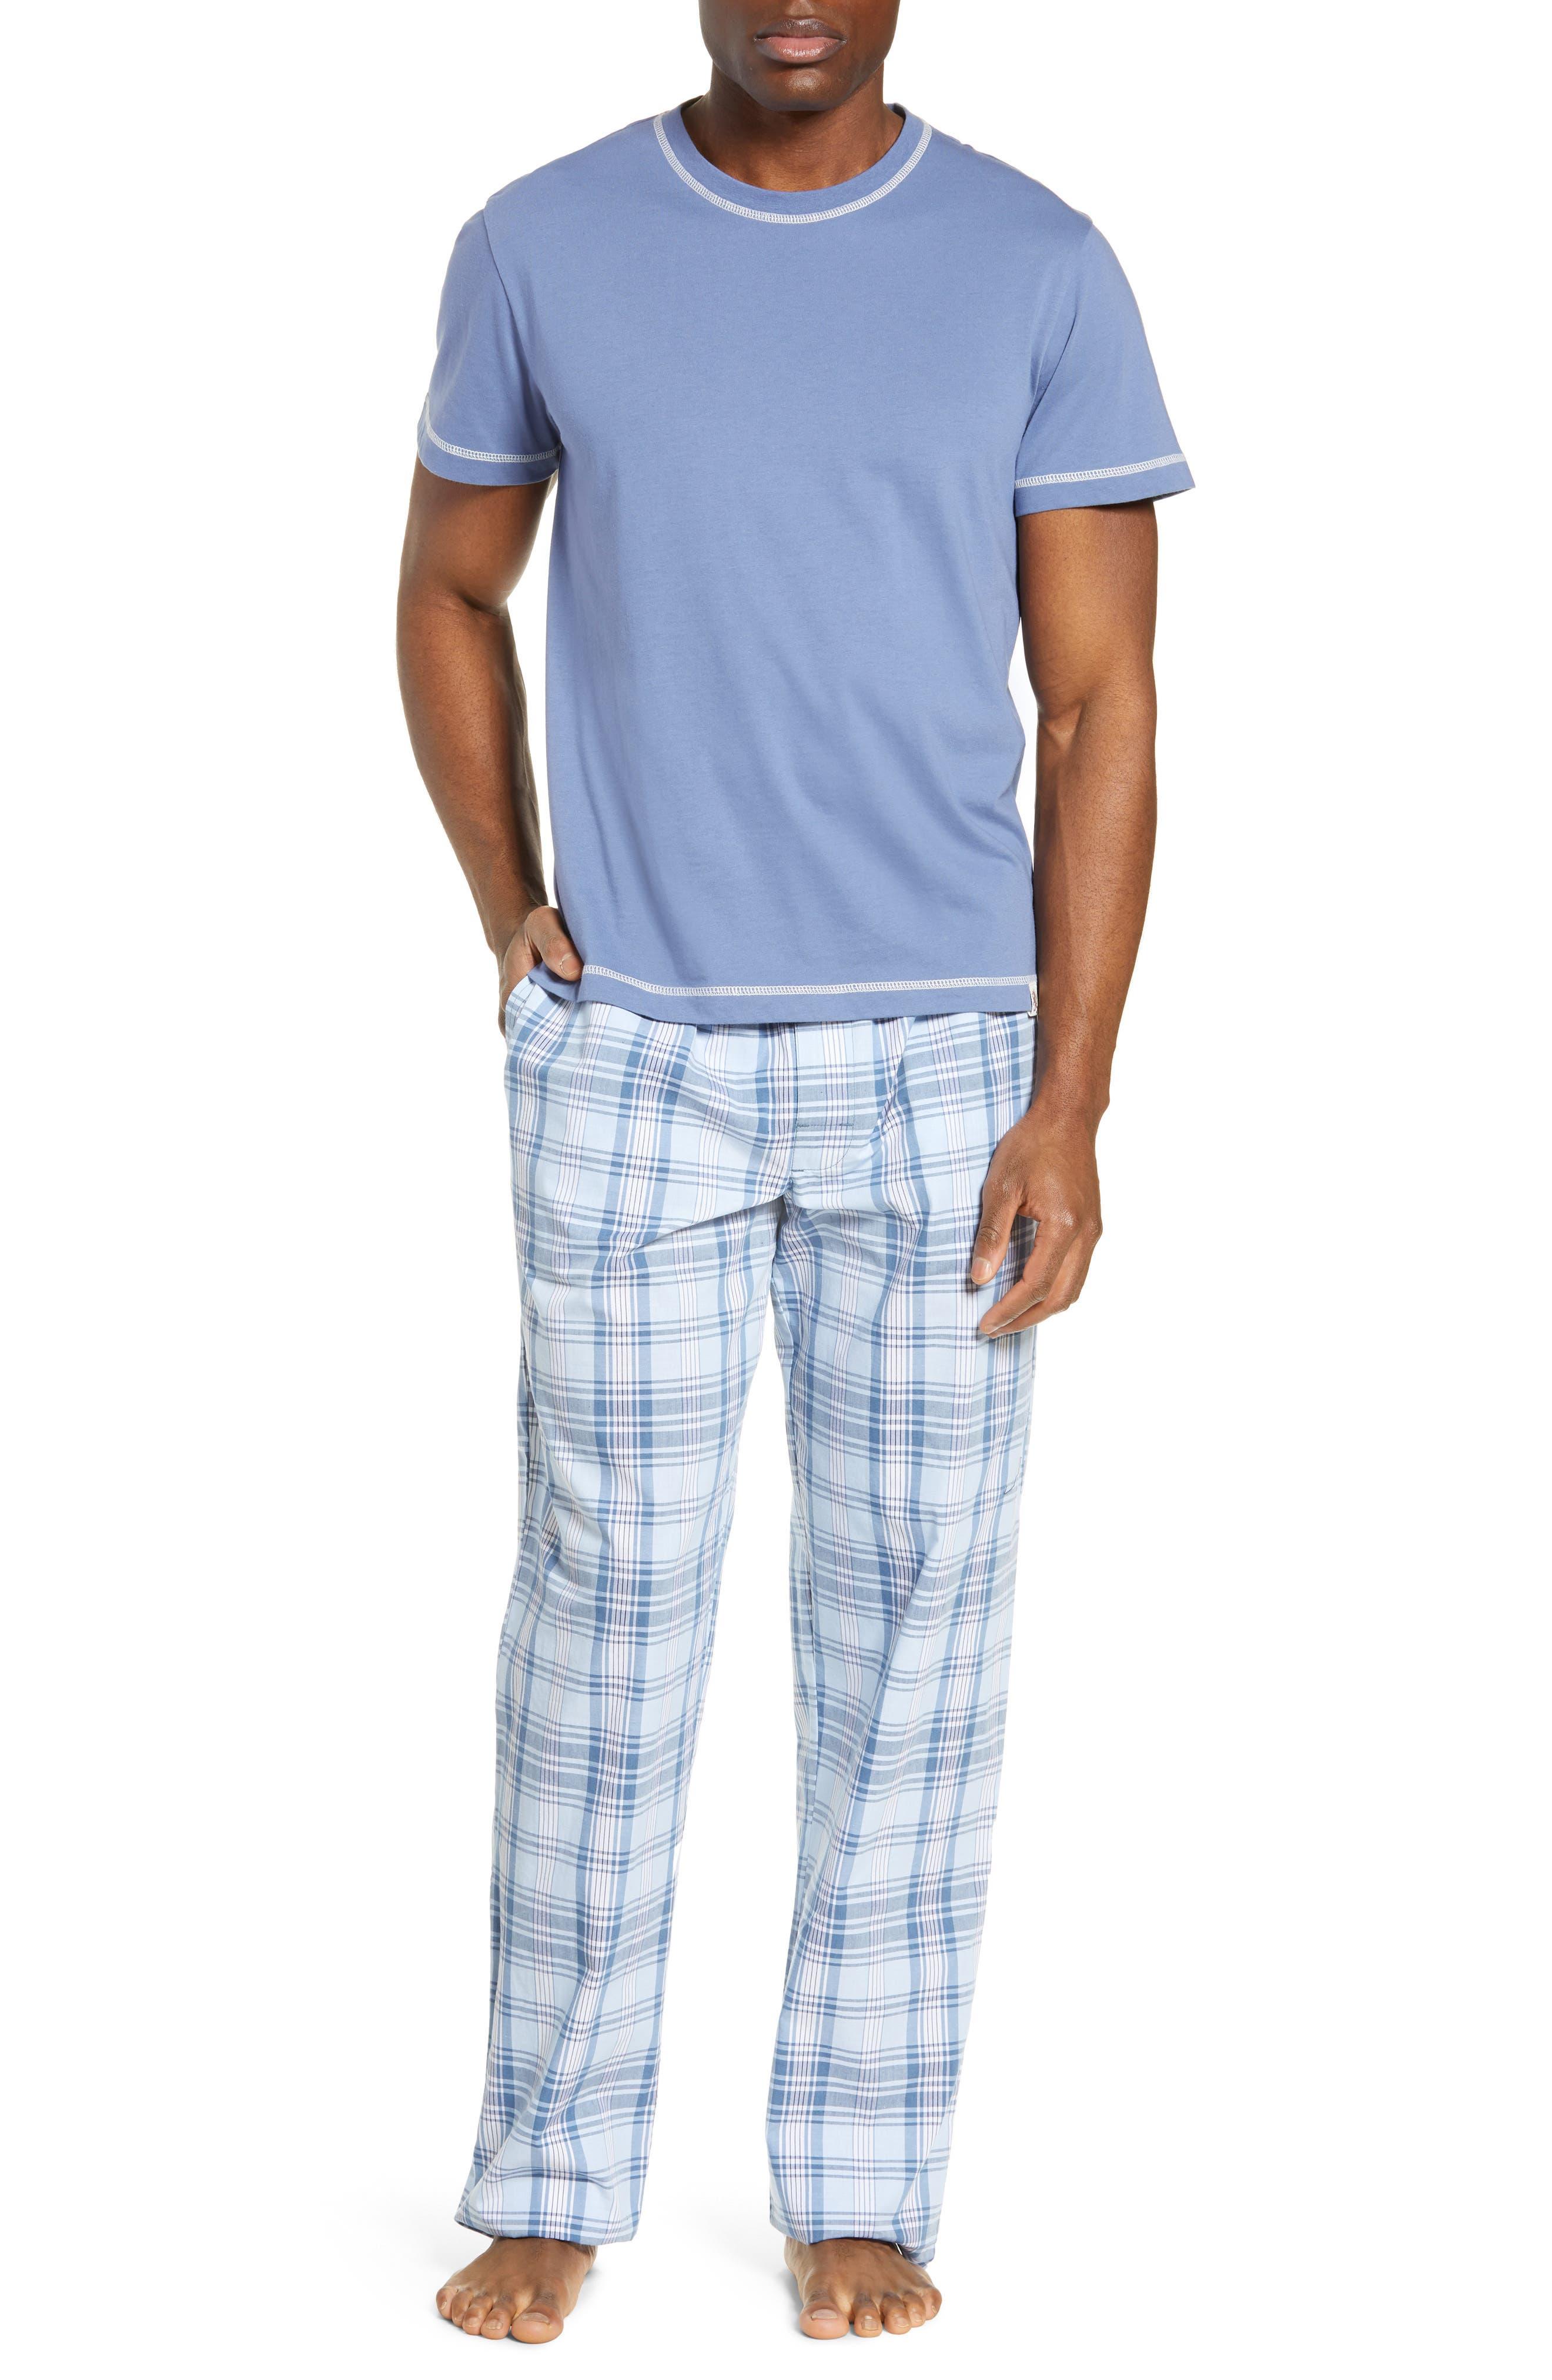 MAJESTIC INTERNATIONAL, Check Mates Pajamas, Main thumbnail 1, color, CAPRI